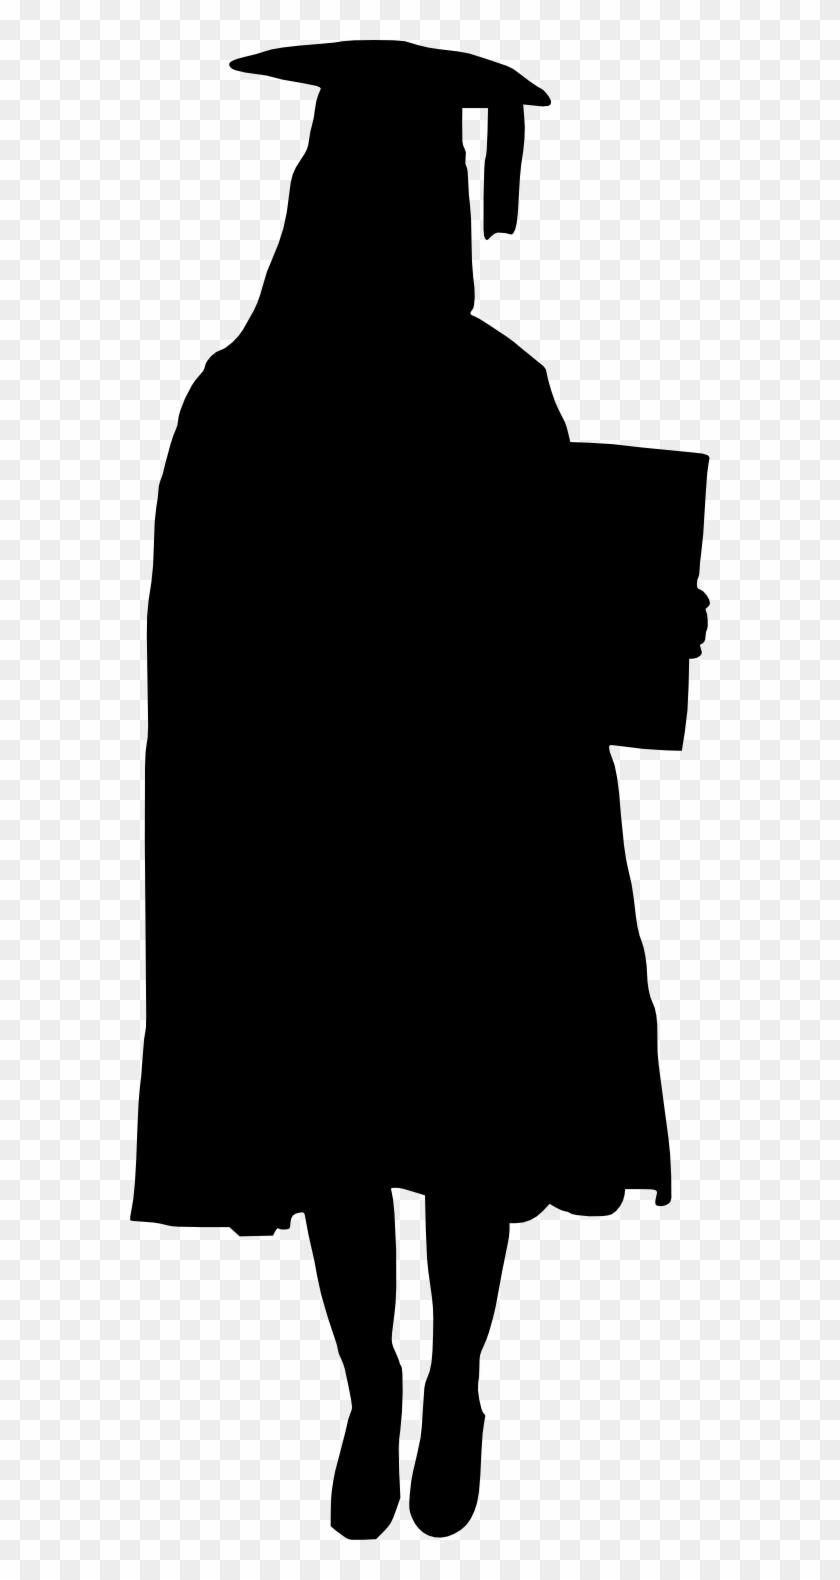 Graduation Silhouette Girl : graduation, silhouette, Graduation, Silhouette, Clipart, Transparent, (#556011), PikPng